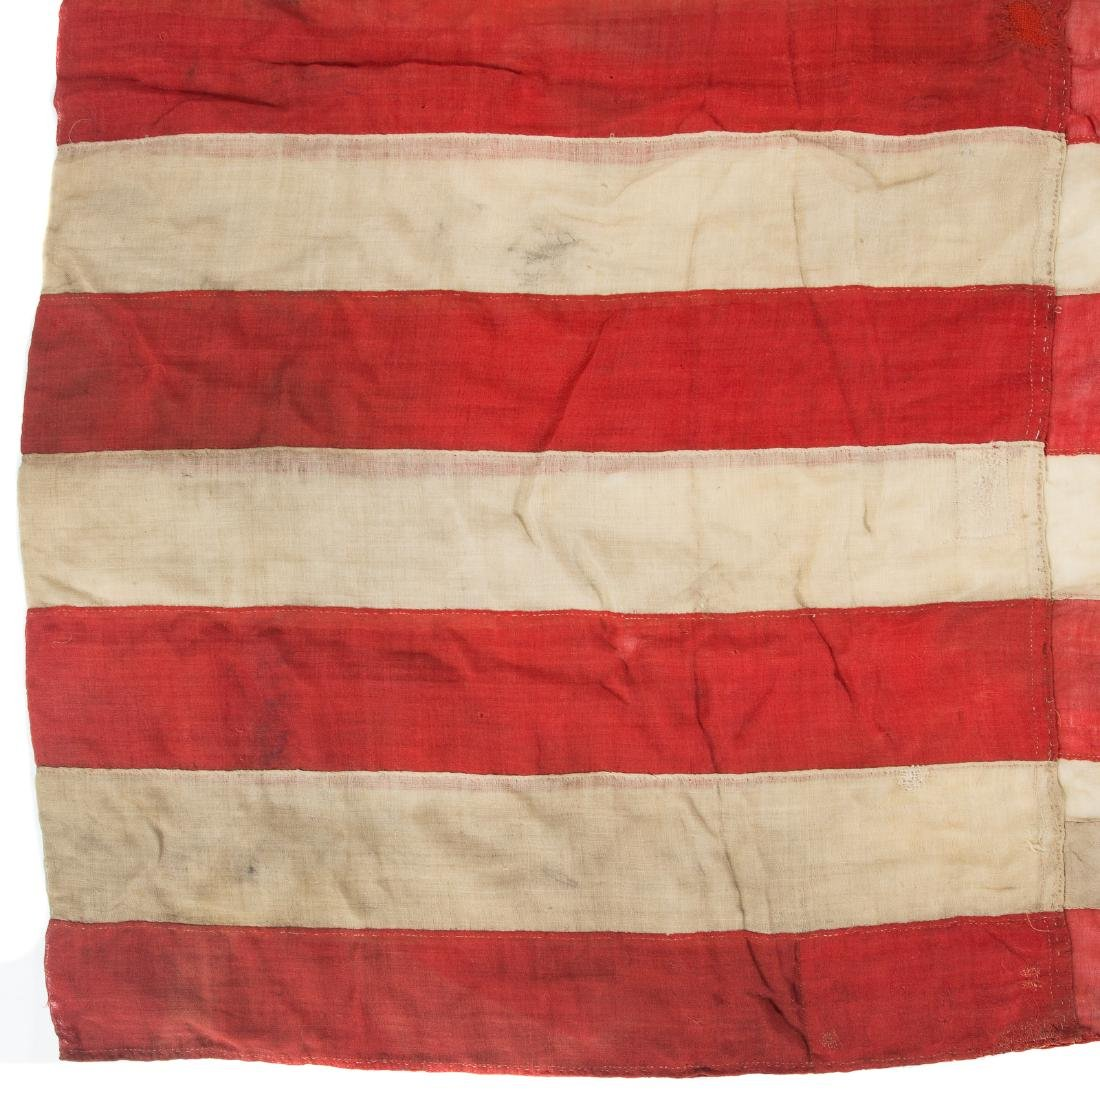 United States 34-star garrison flag - 9